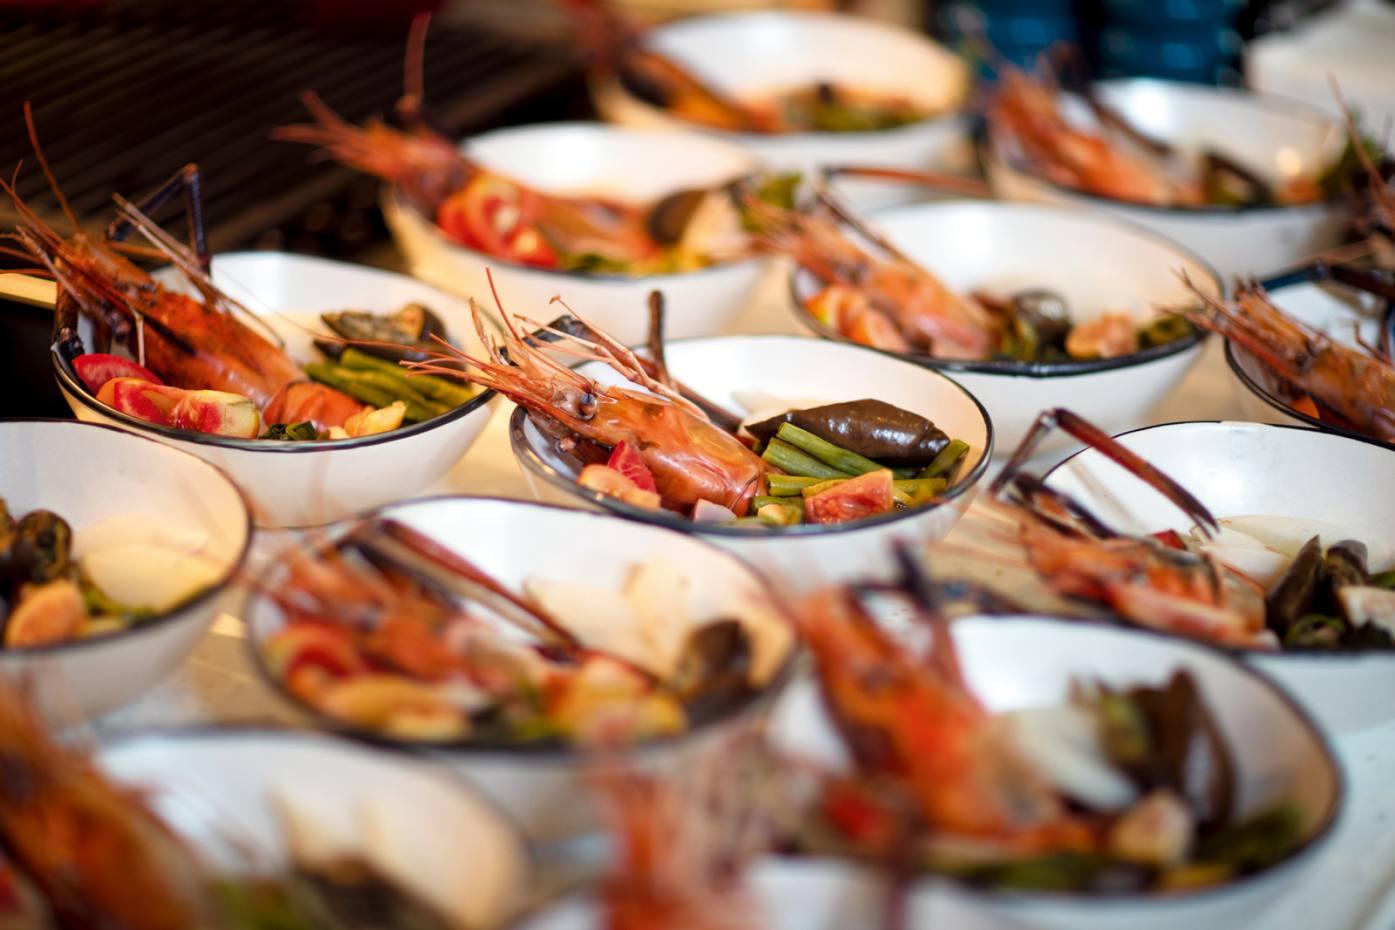 Silversea's new SALT gastronomic adventure will launch in Trieste aboard Silver Moon inAugust next year